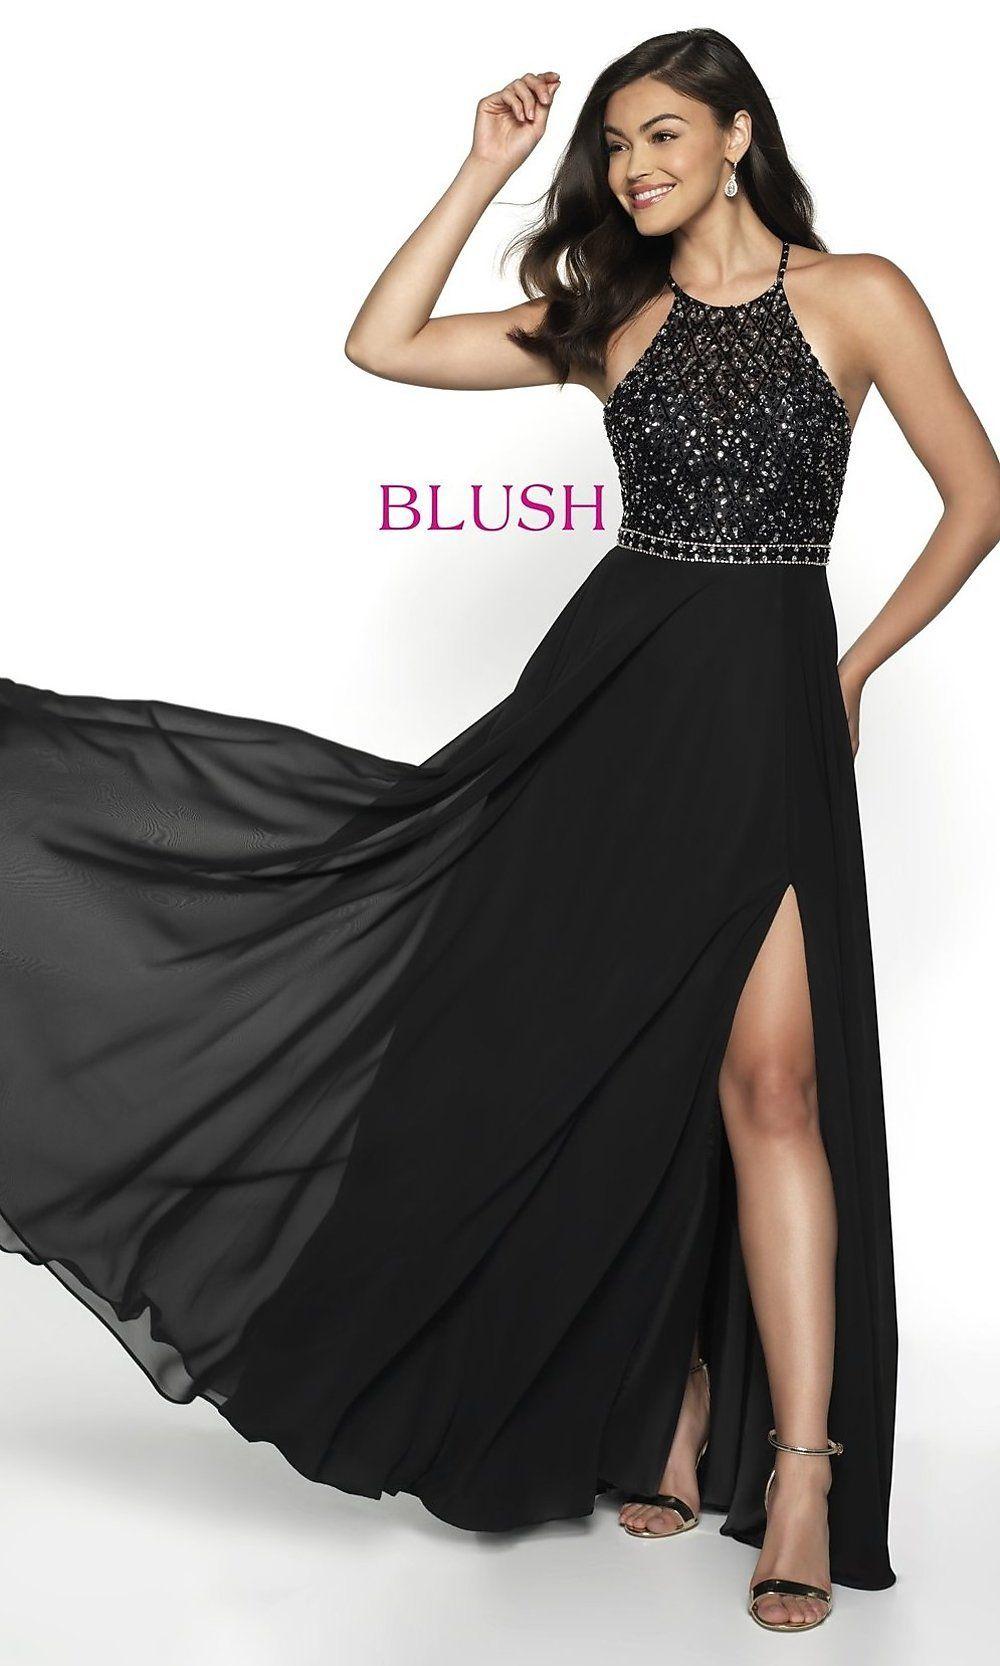 edfbc8949e0 Long Open-Back Beaded Designer Prom Dress by Blush in 2019